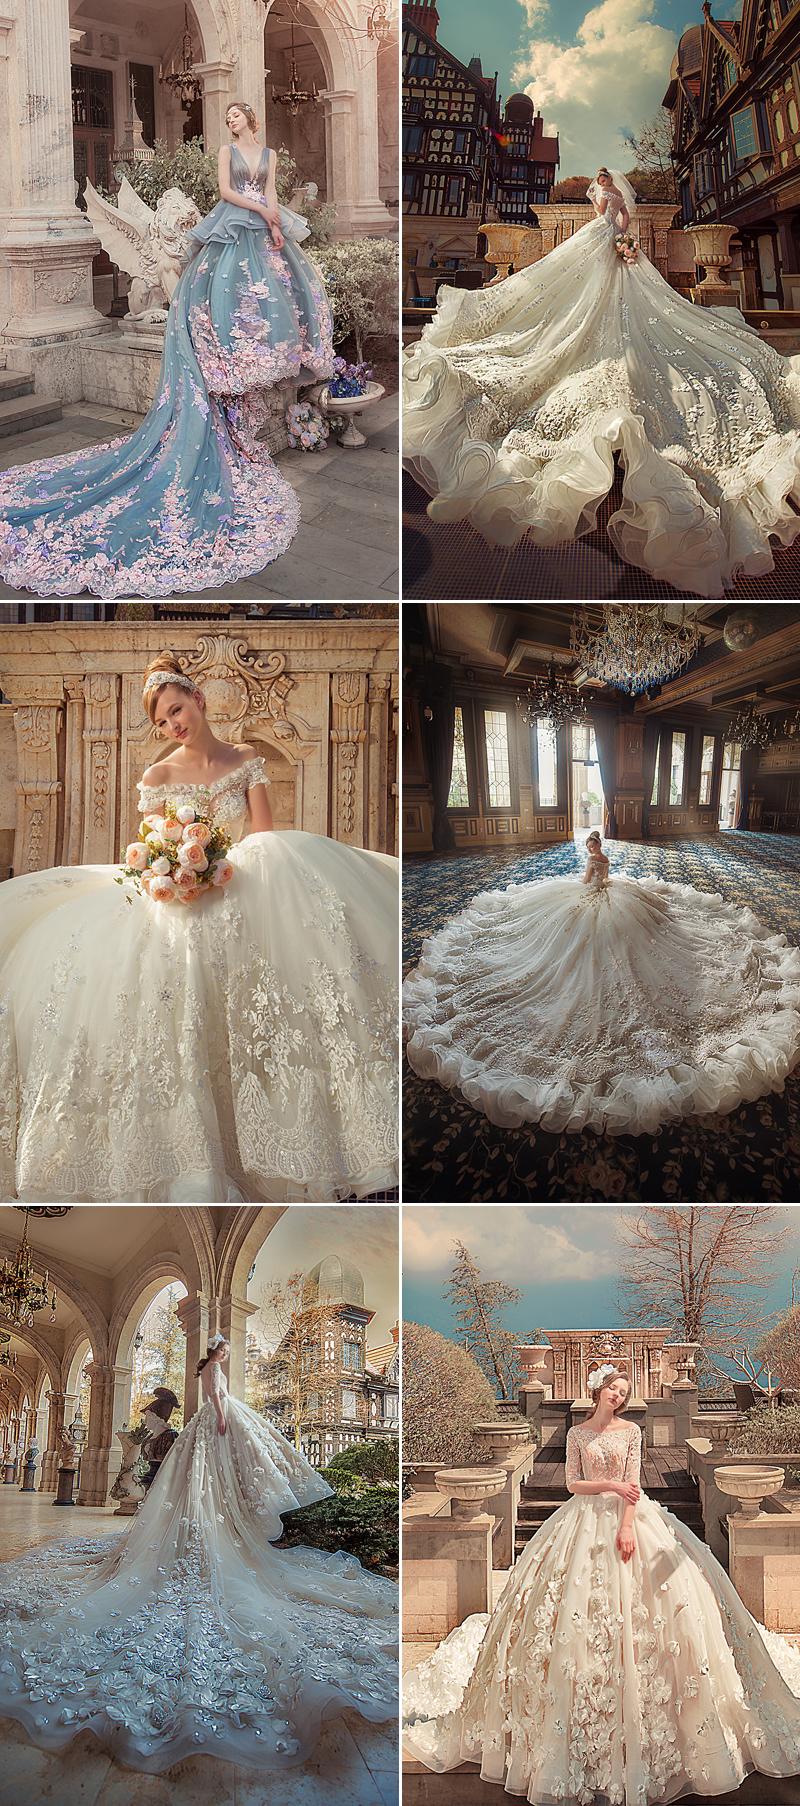 Bella wedding dress with extraordinary model design